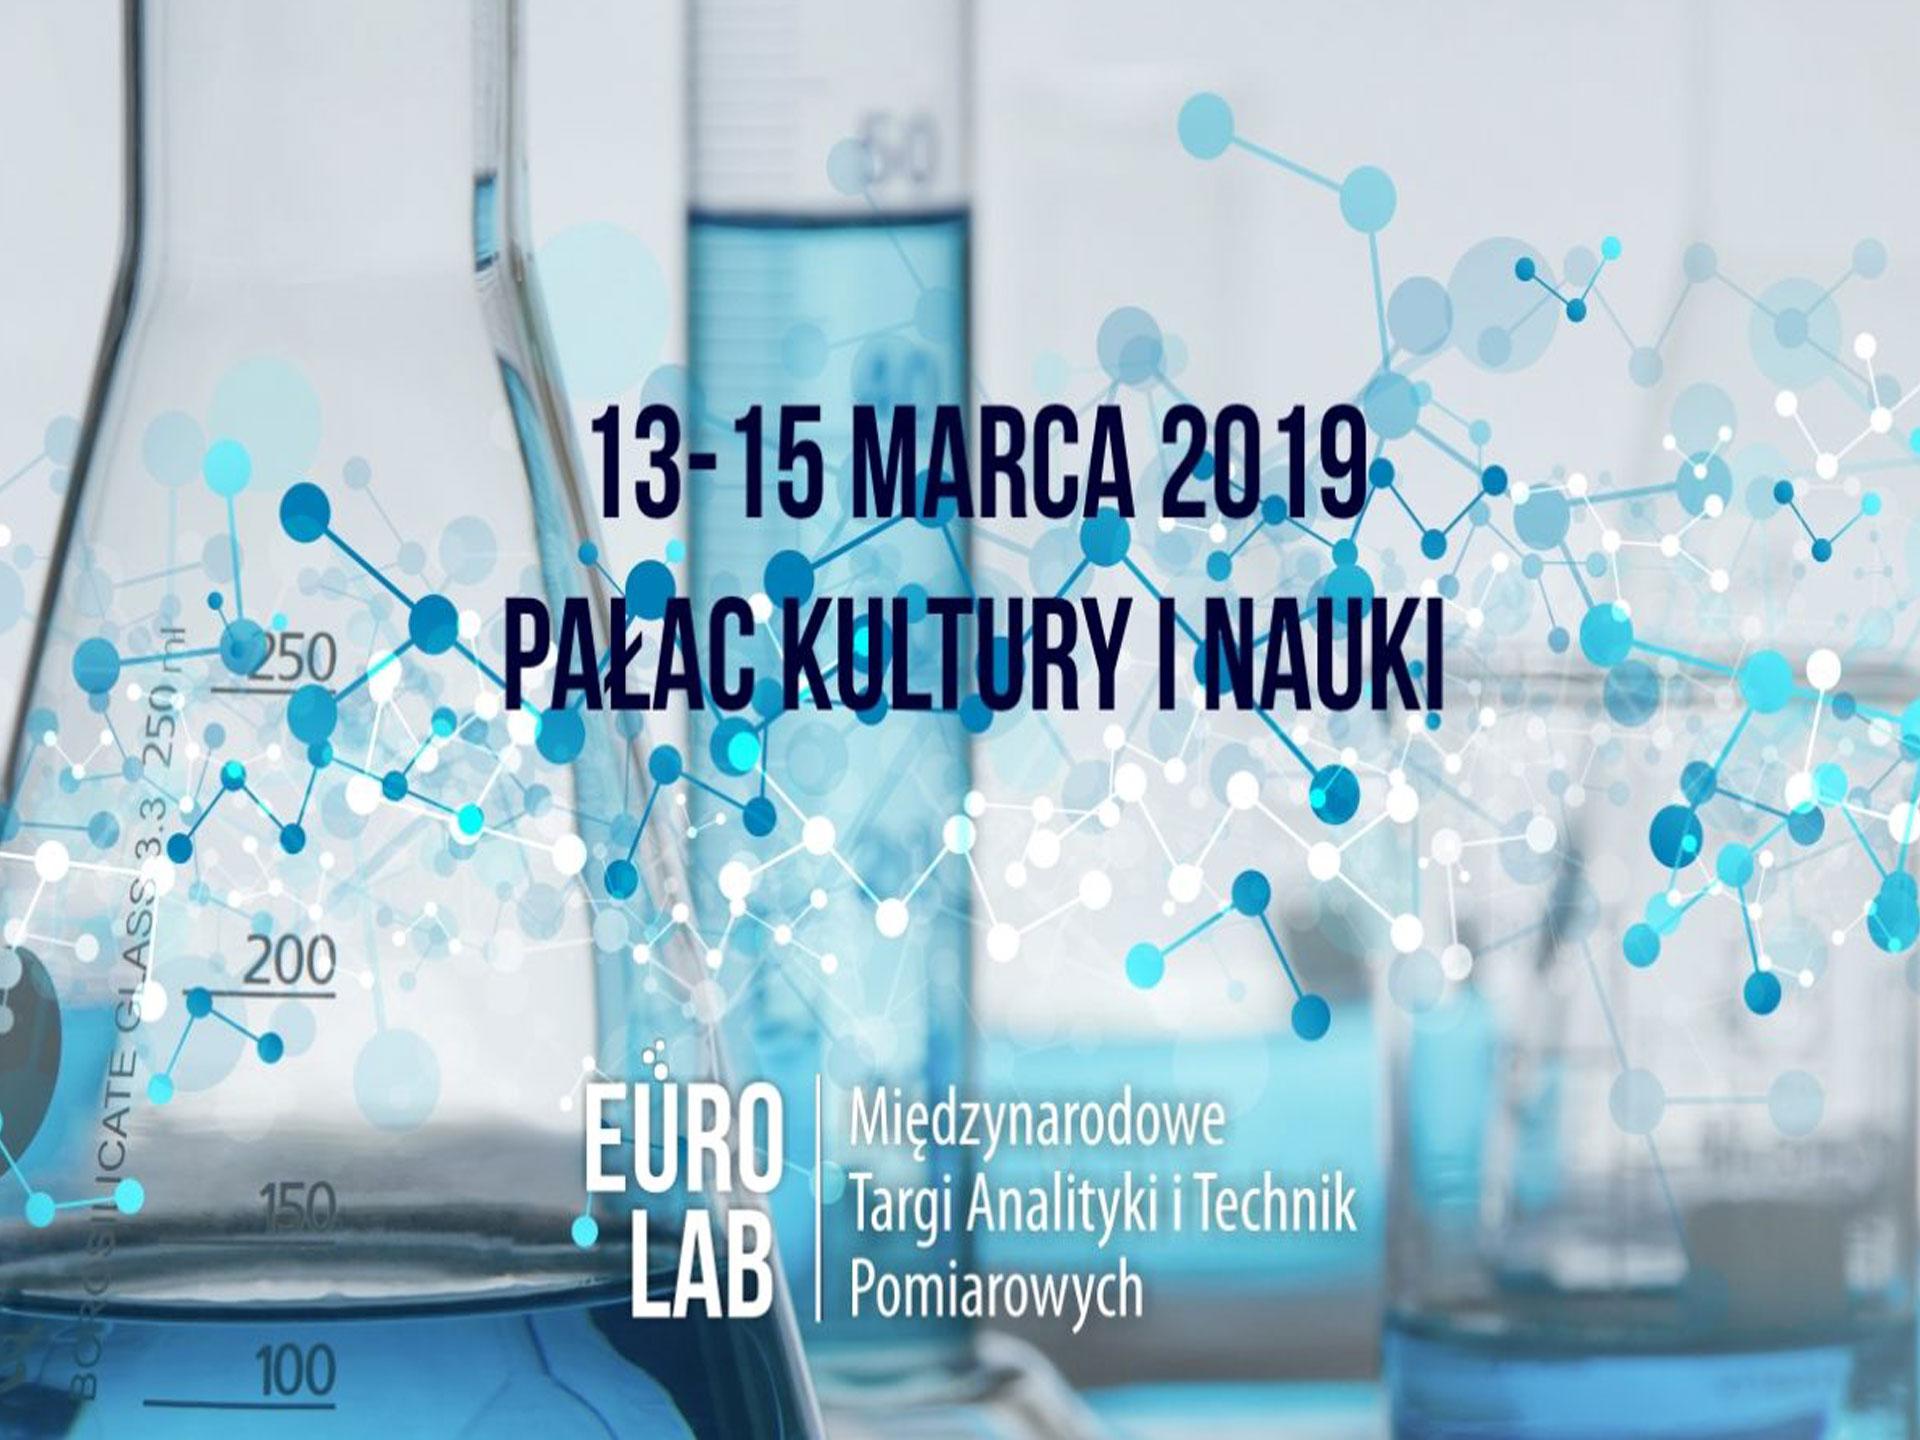 Targi laboratoryjne EuroLab 2019 - Bentley Polska